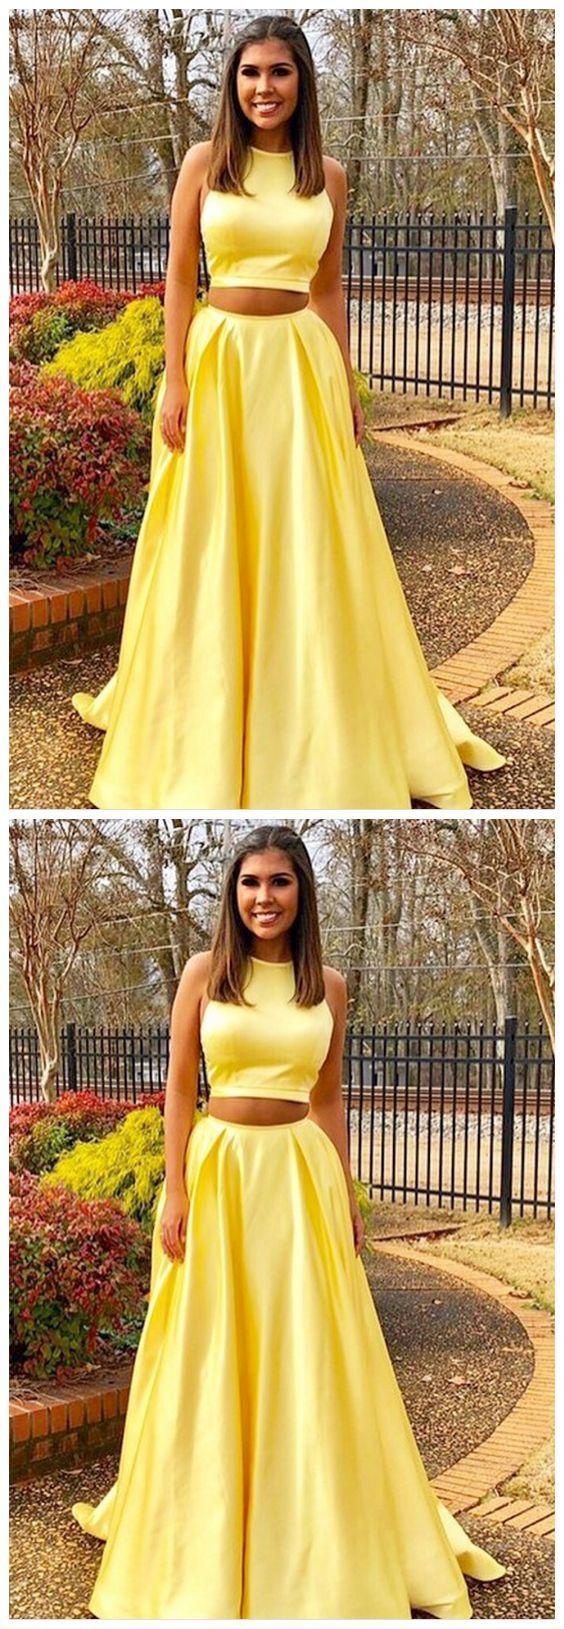 Prom Dresses ,Evening Dress, Two Piece Prom Dresses,Yellow dresses